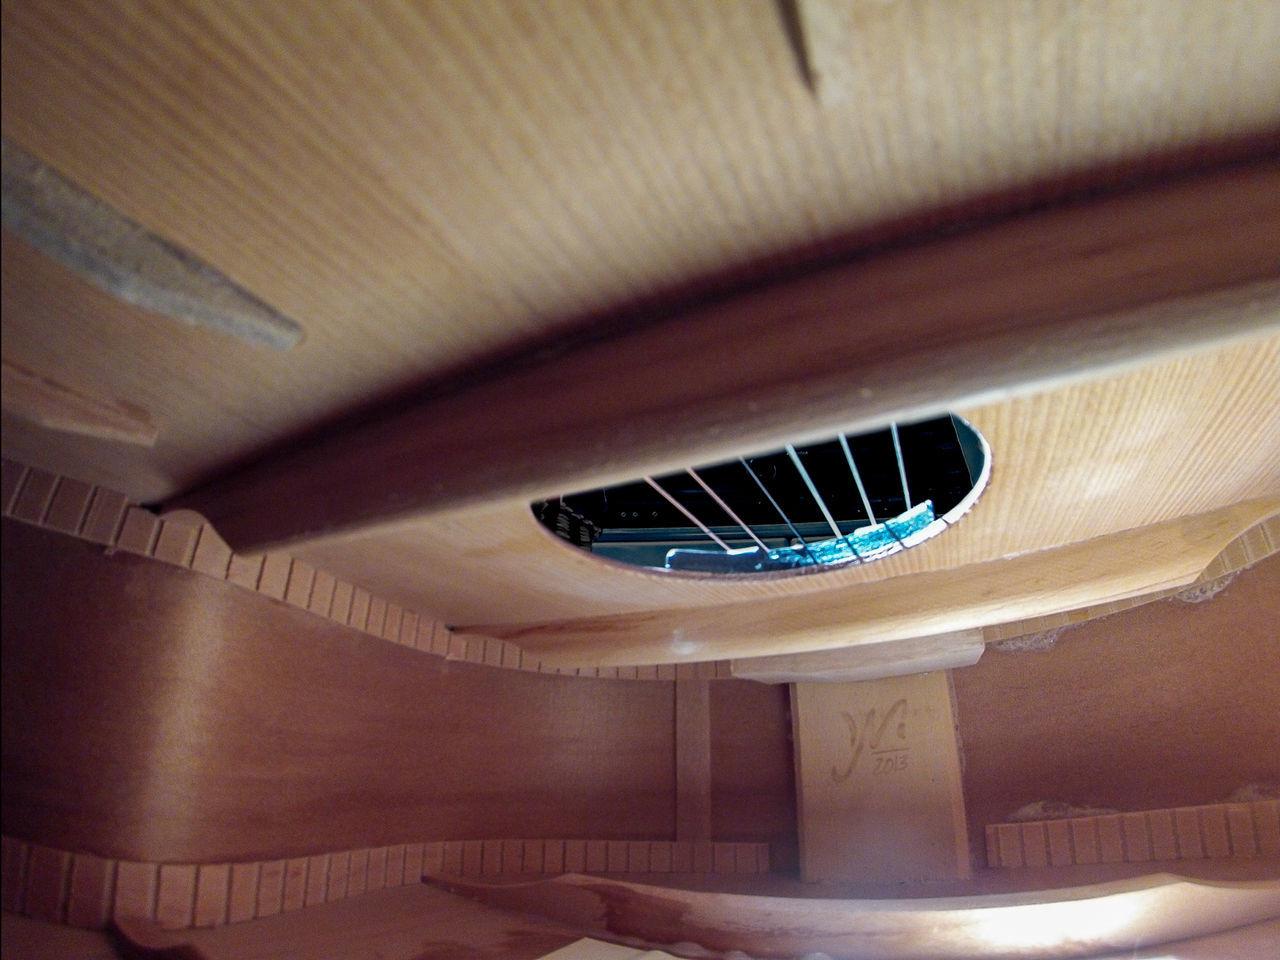 Classical Guitar Guitar Inside Inside Things Music Musical Instrument String Instrument Strings Unusual View